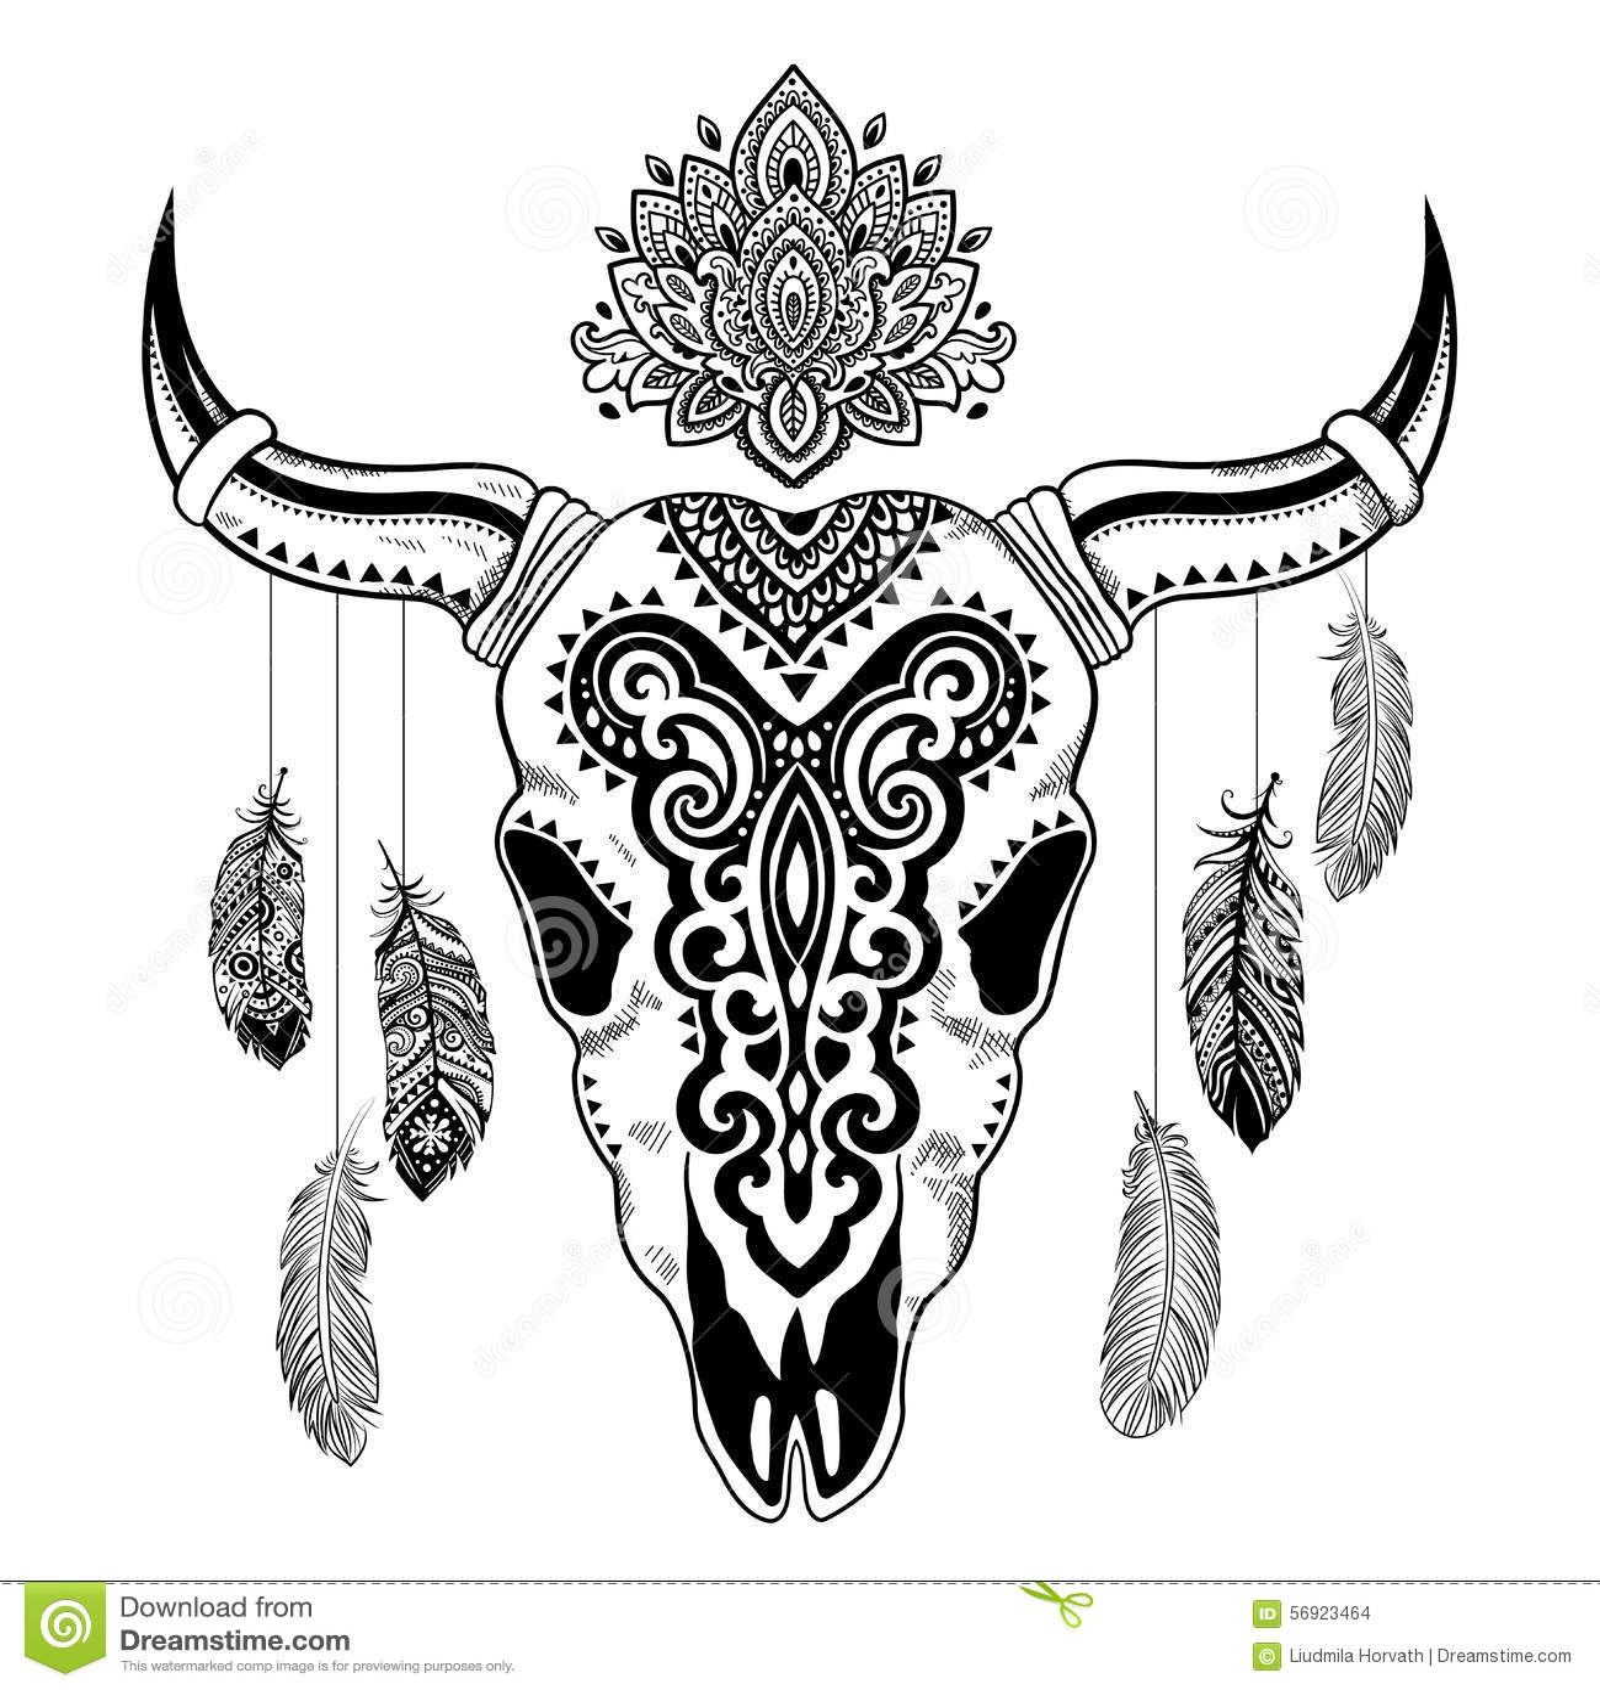 illustration animale tribale de cr ne avec ethnique illustration stock illustration du death. Black Bedroom Furniture Sets. Home Design Ideas